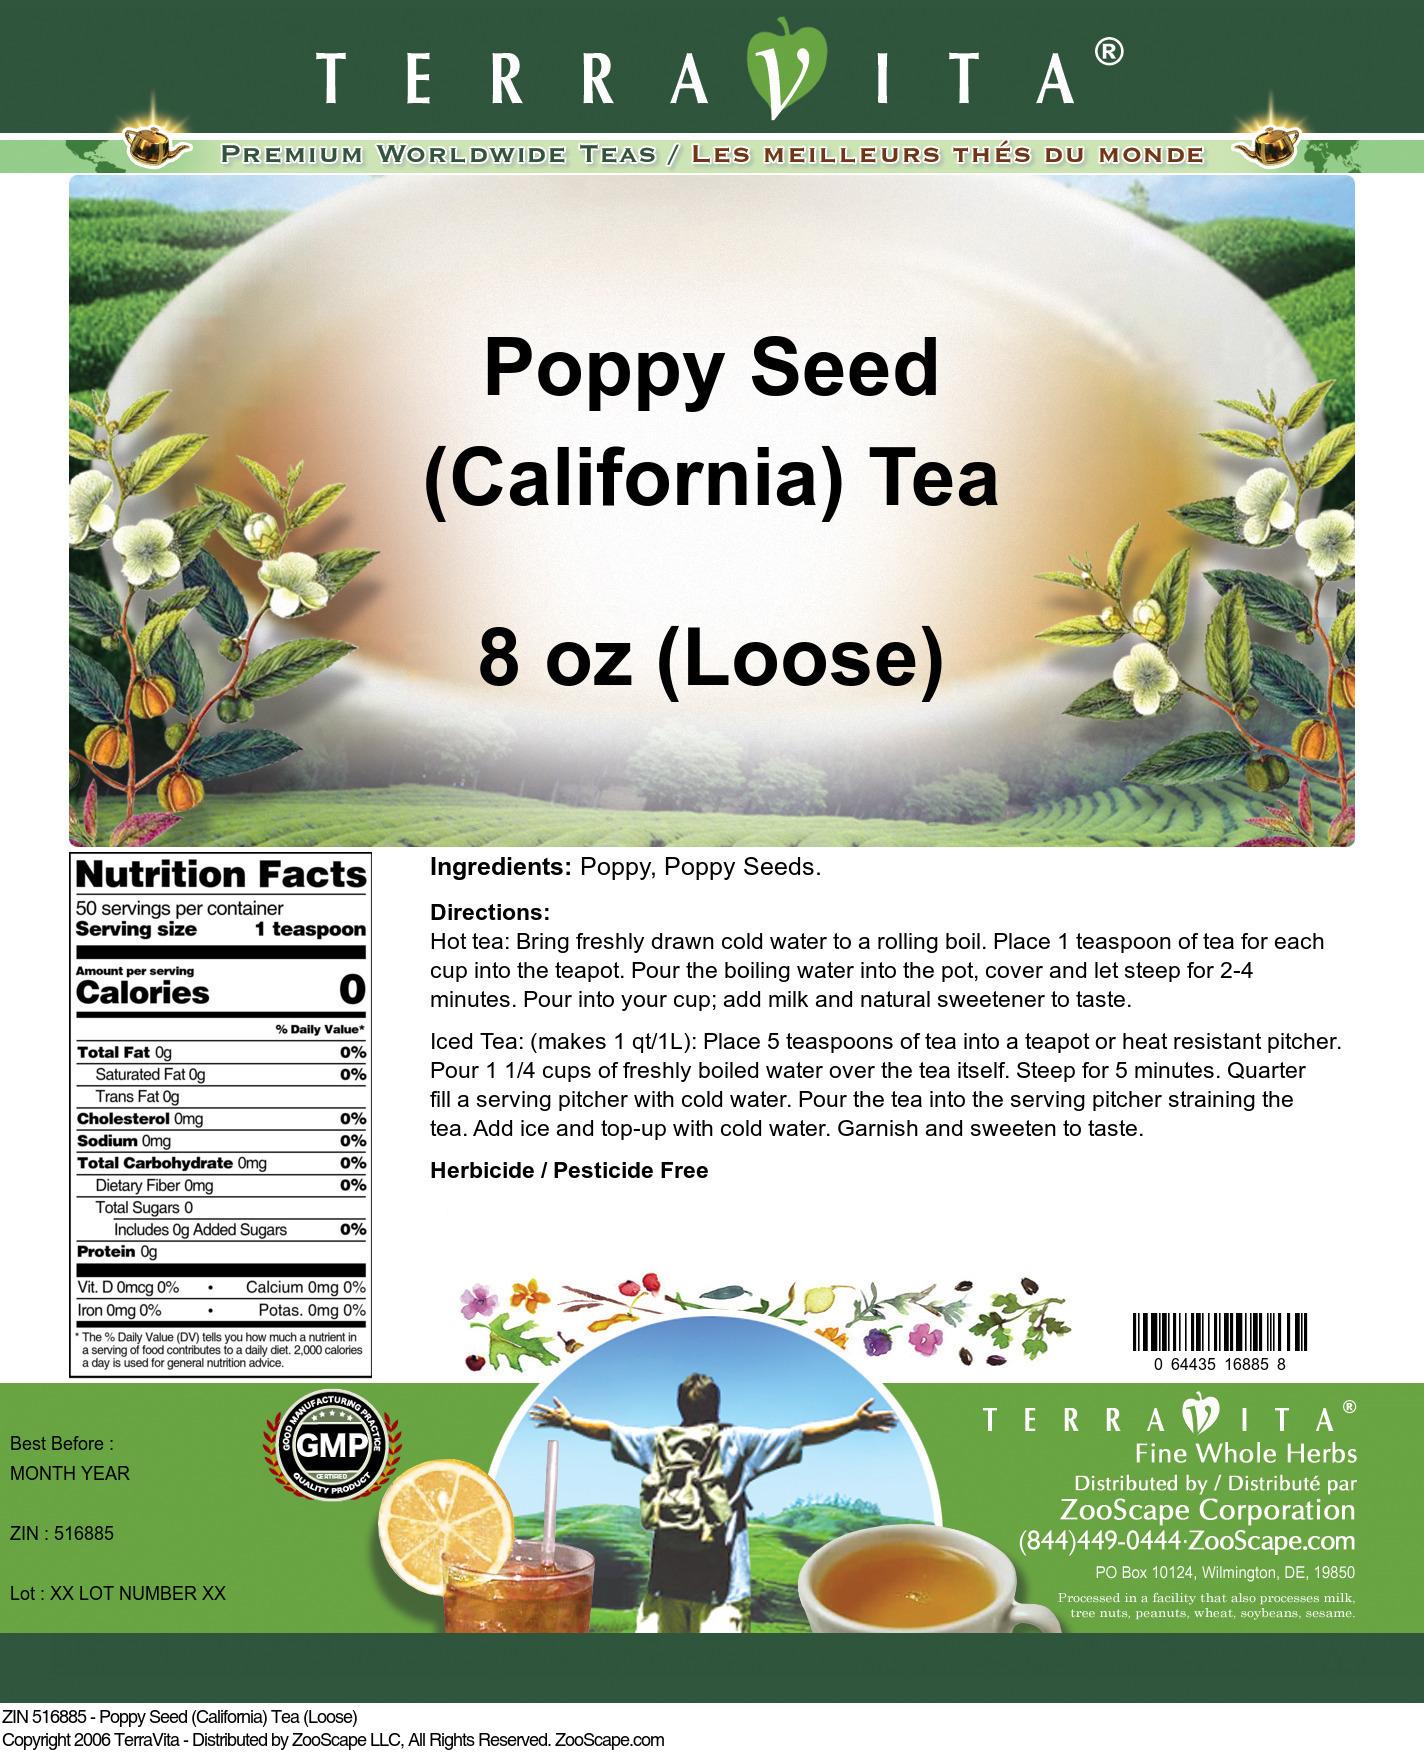 Poppy Seed (California) Tea (Loose)